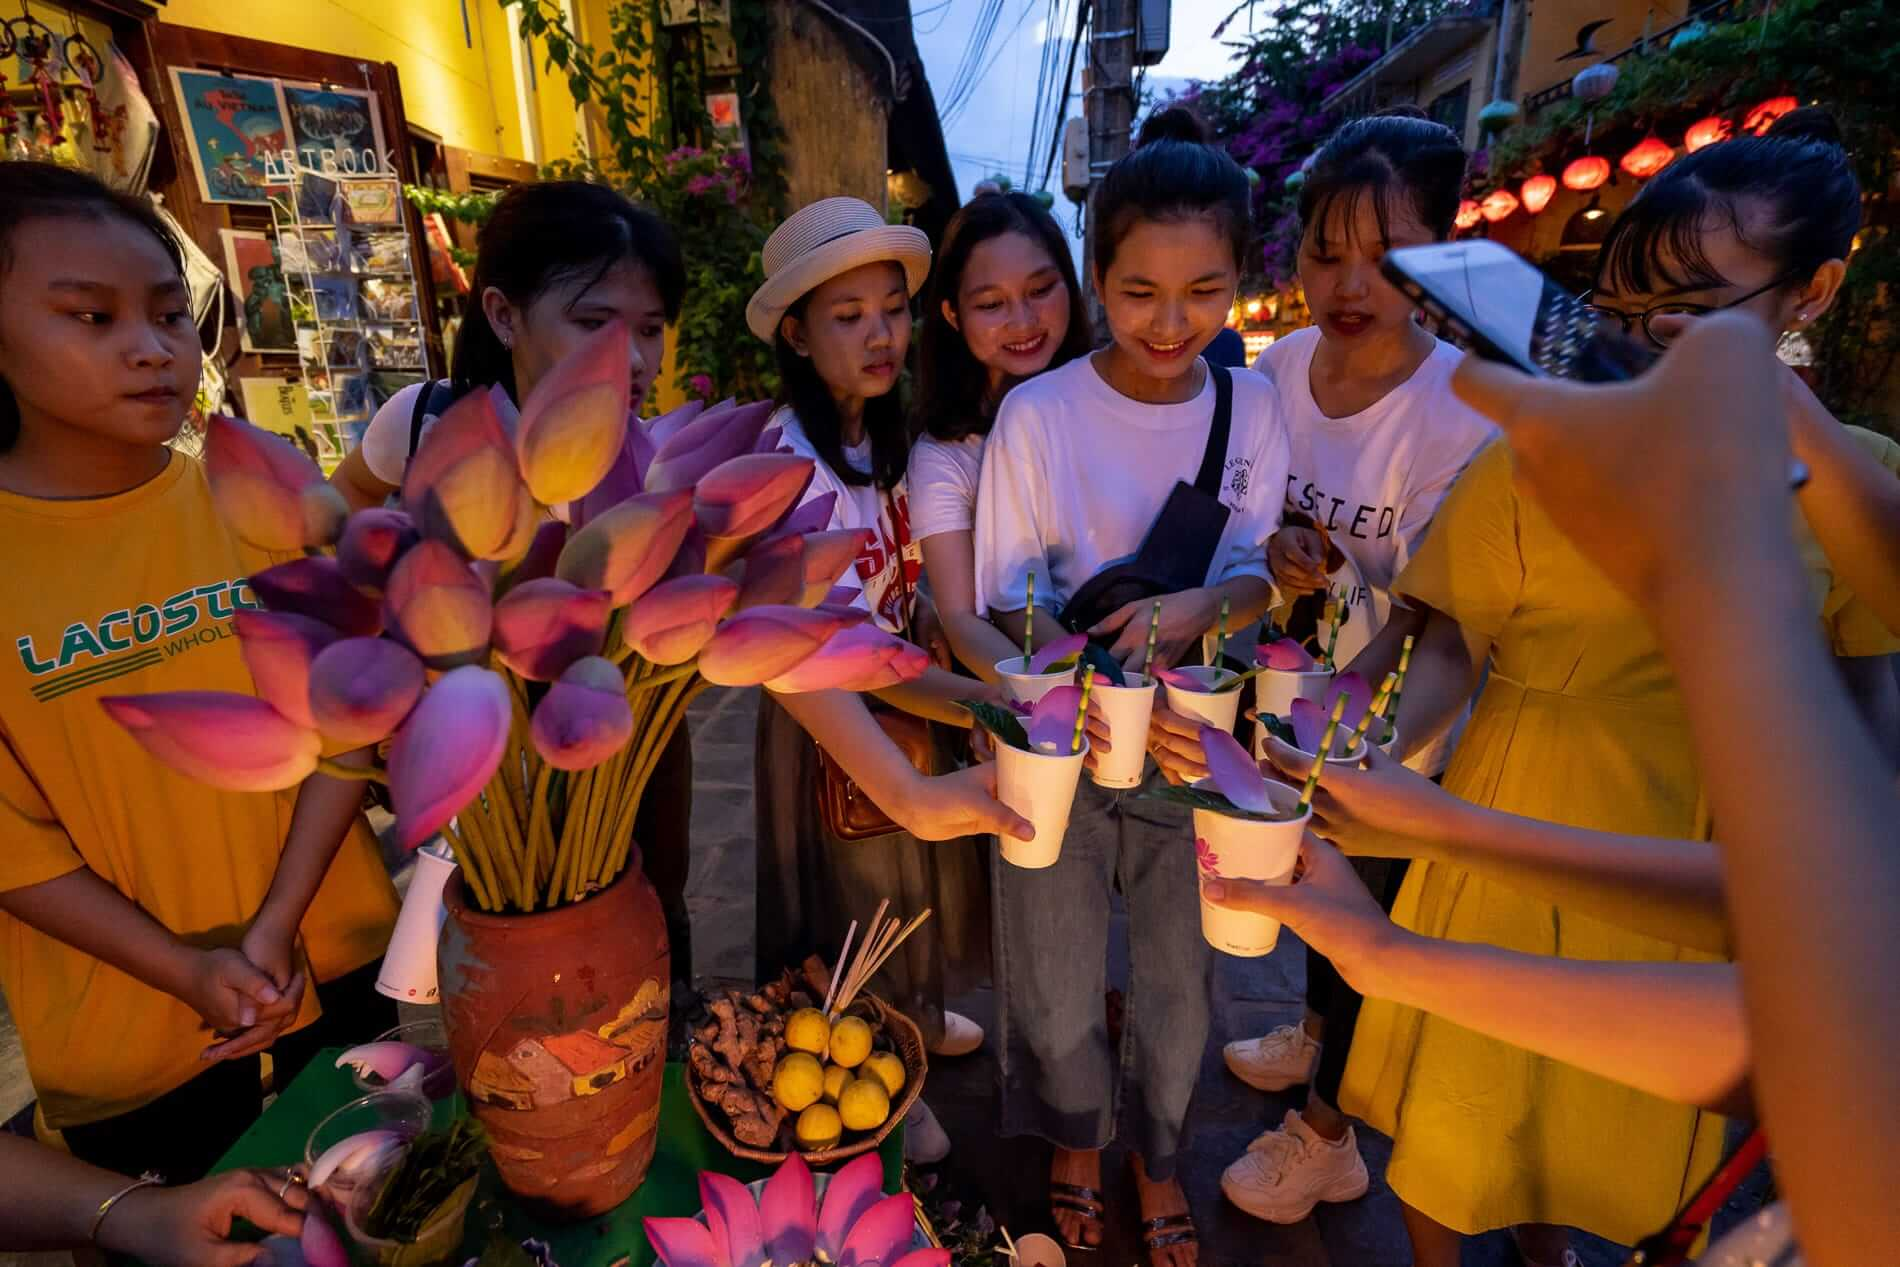 A group enjoying a herbal tea on the street